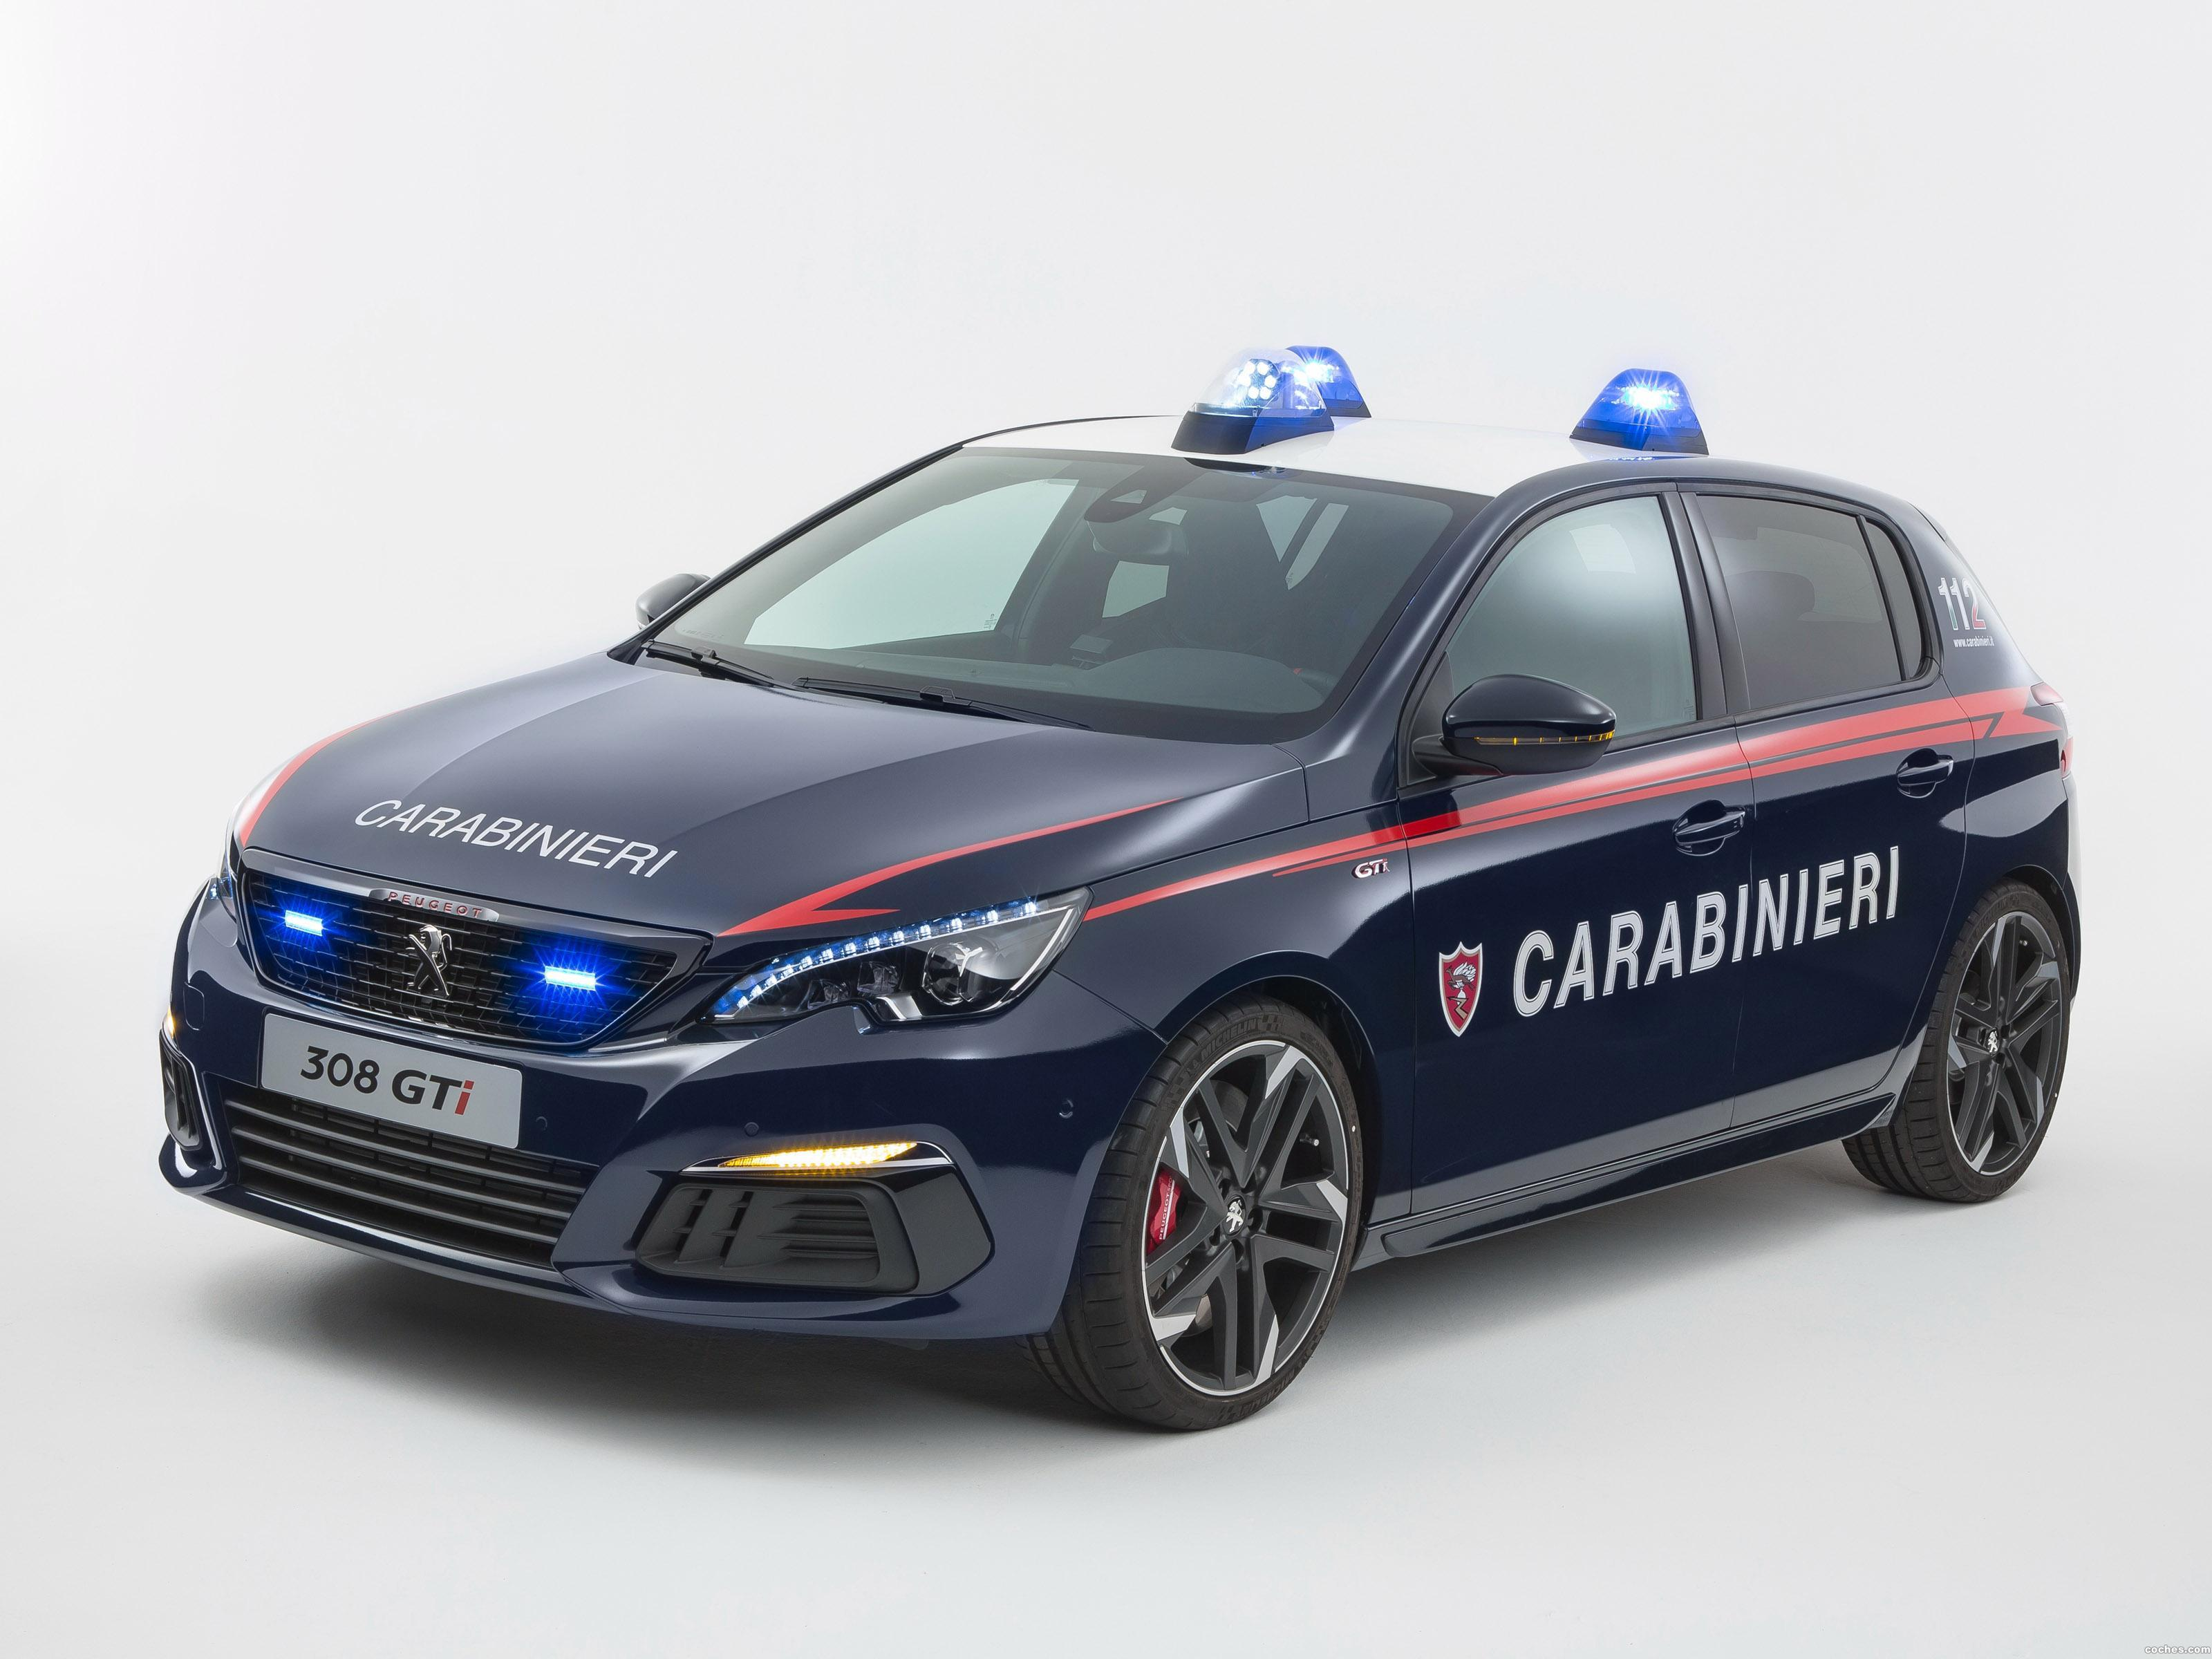 peugeot_308-gti-carabinieri-2017_r6.jpg